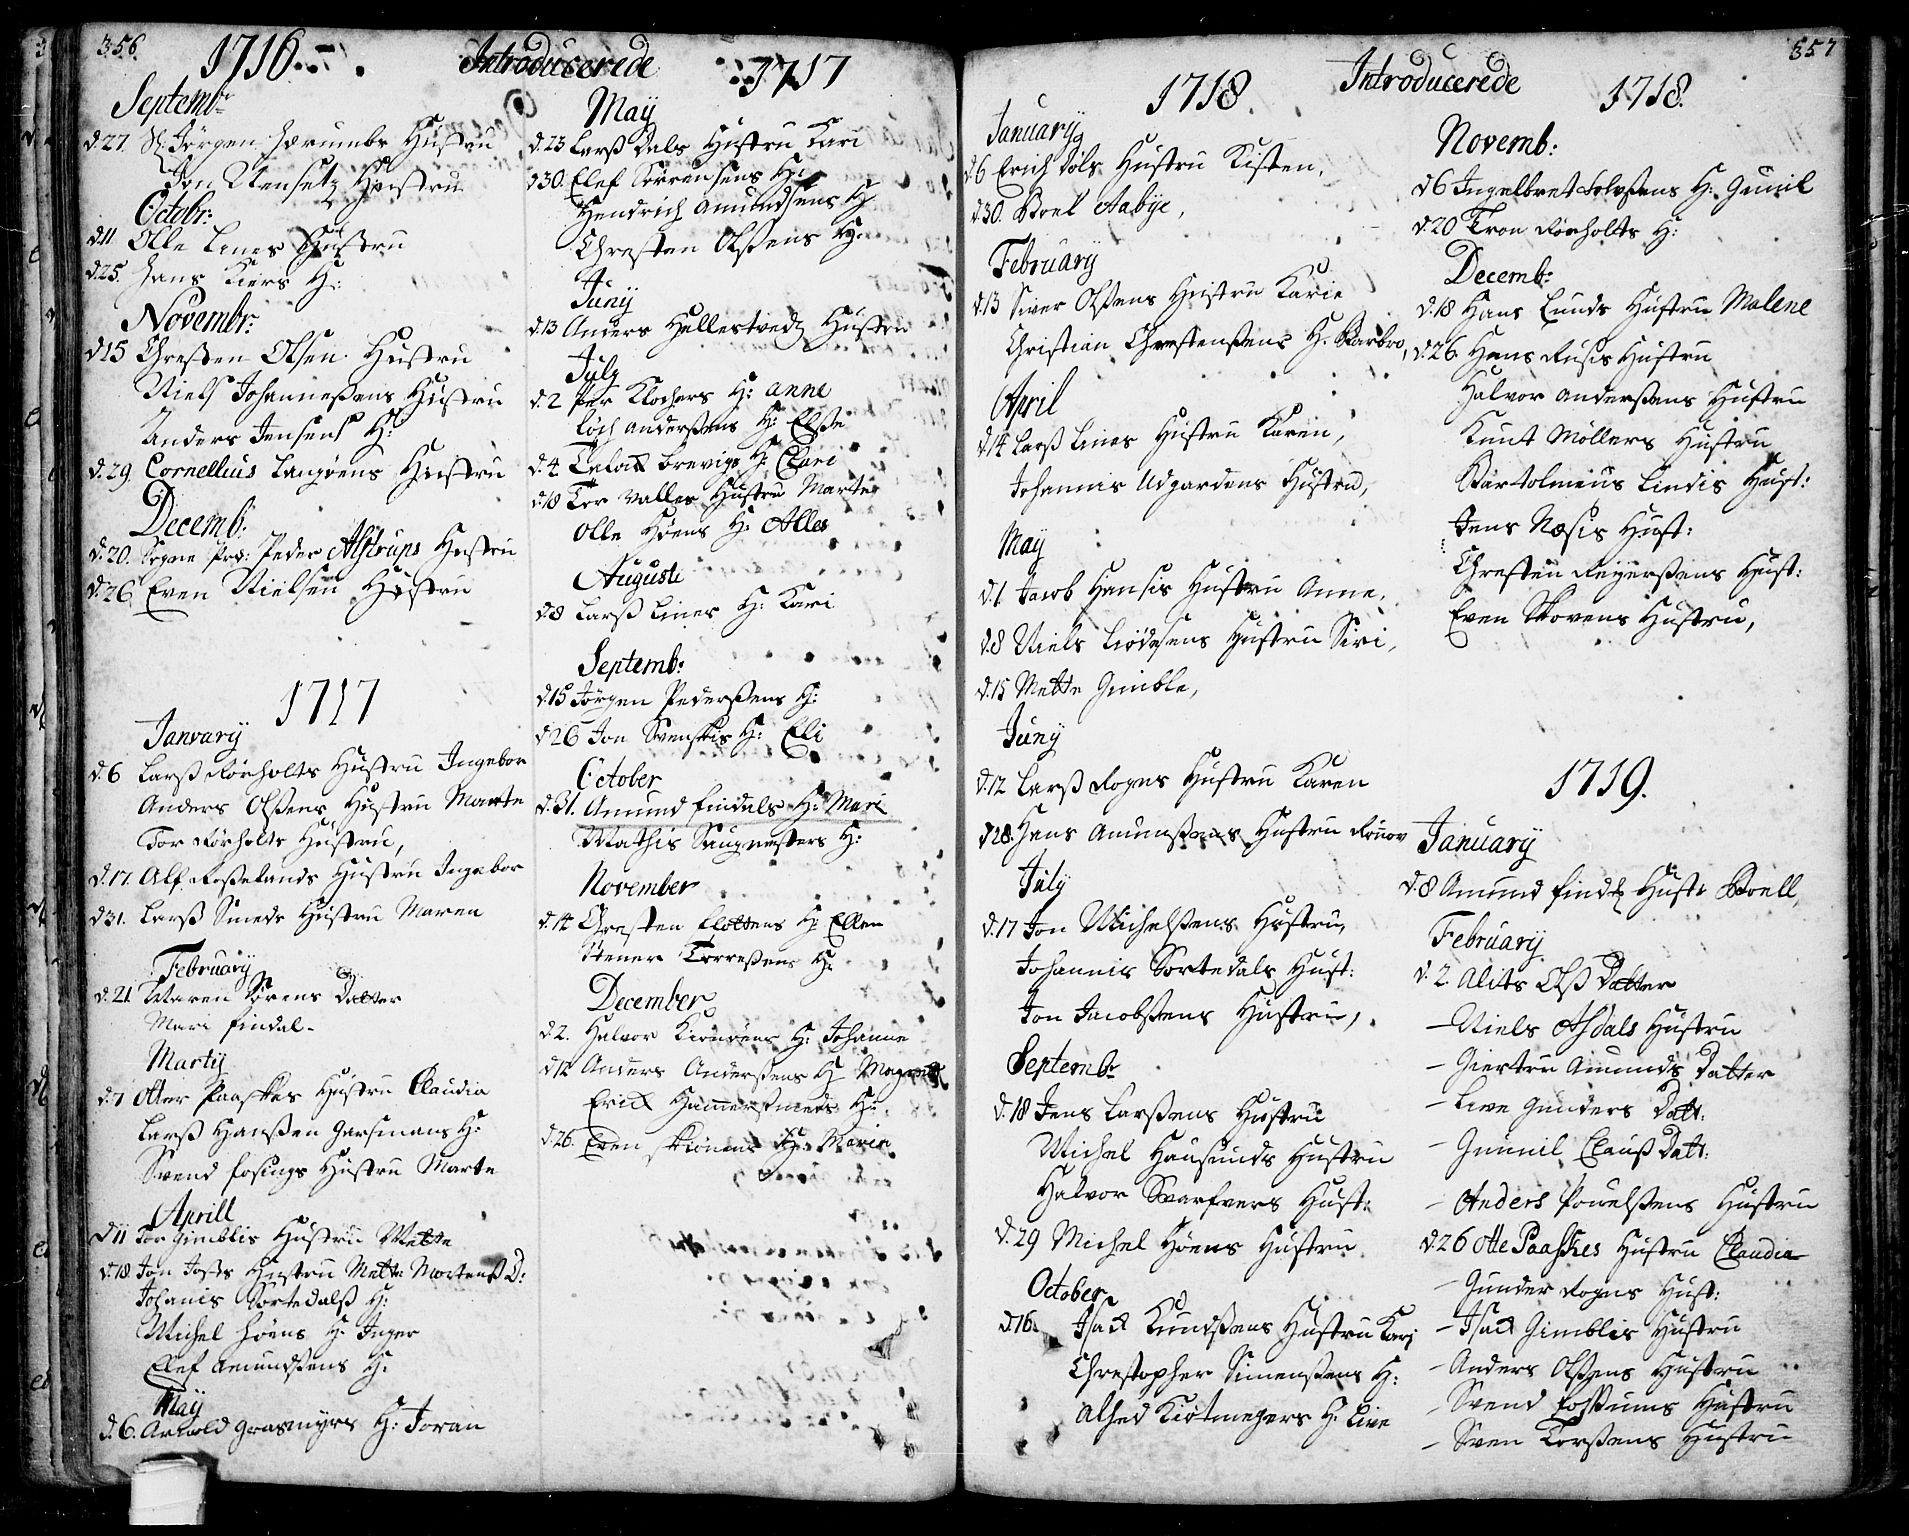 SAKO, Bamble kirkebøker, F/Fa/L0001: Ministerialbok nr. I 1, 1702-1774, s. 356-357